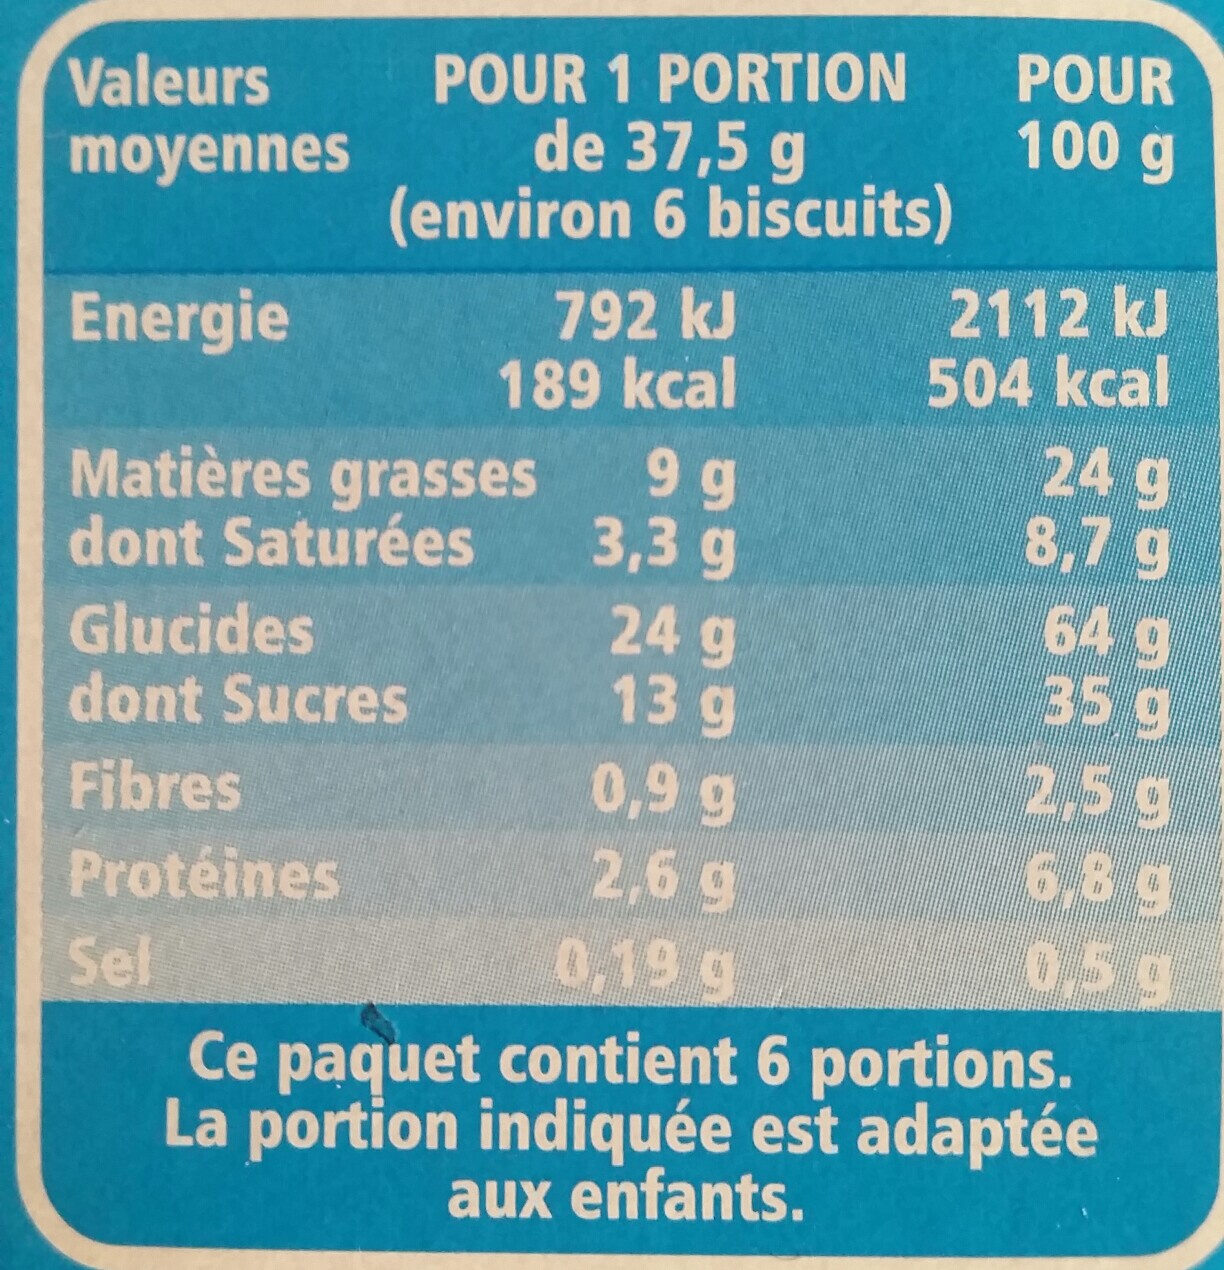 Mini tartelettes choco coeur au lait - Voedingswaarden - fr